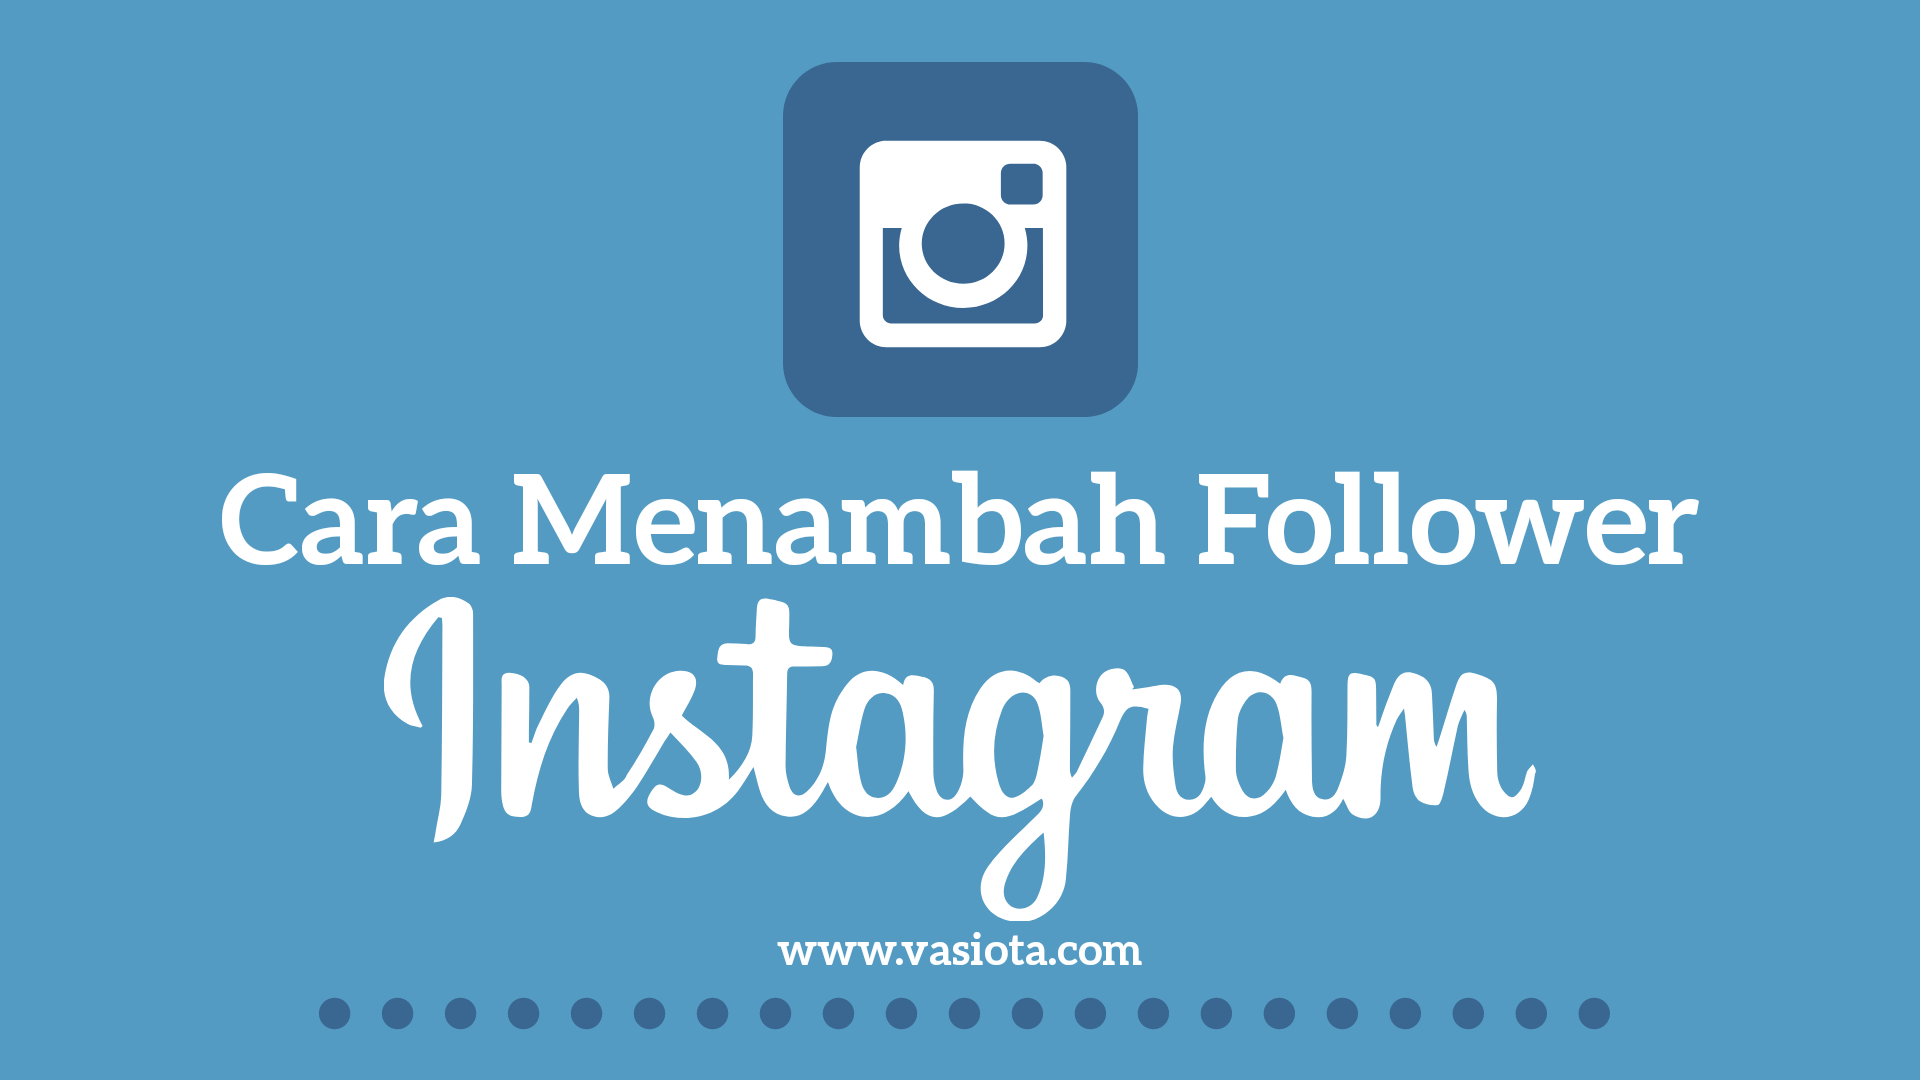 Cara Menambah Follower Instagram secara Alami